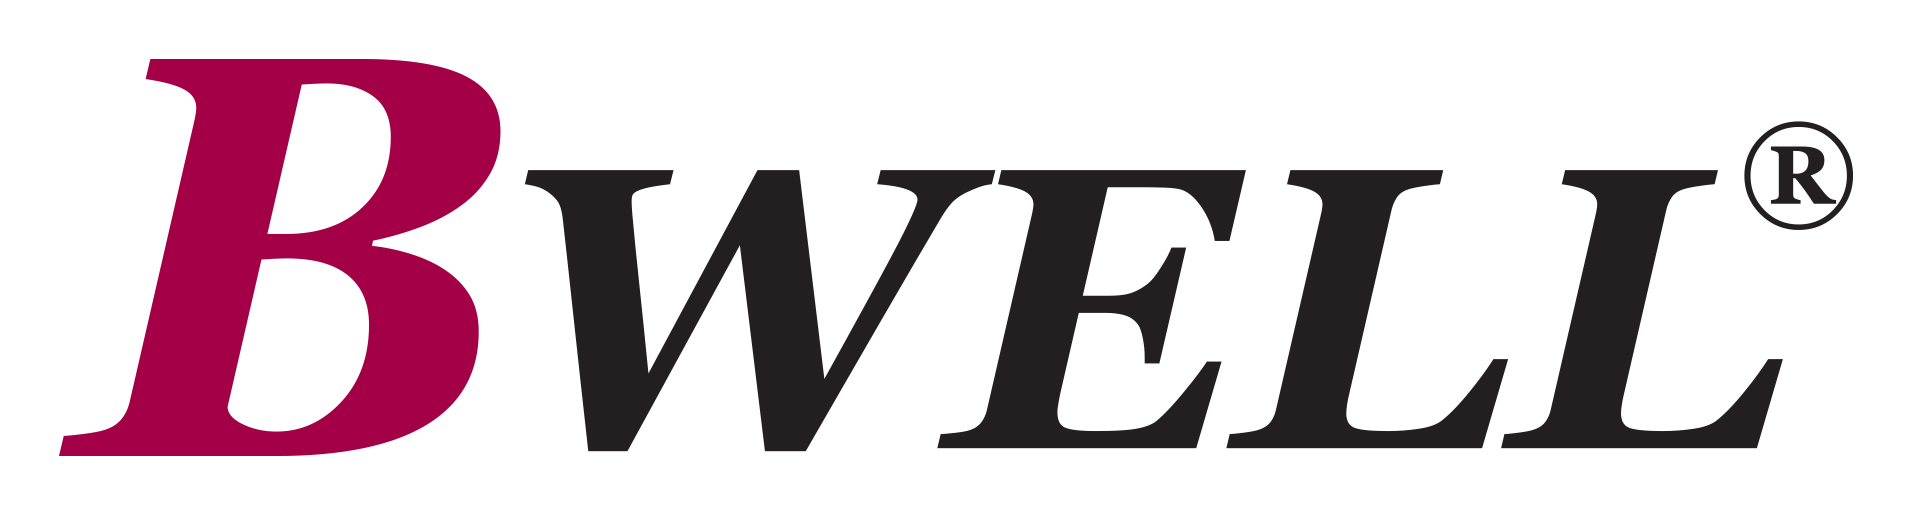 Bwell u txt_logo.jpg